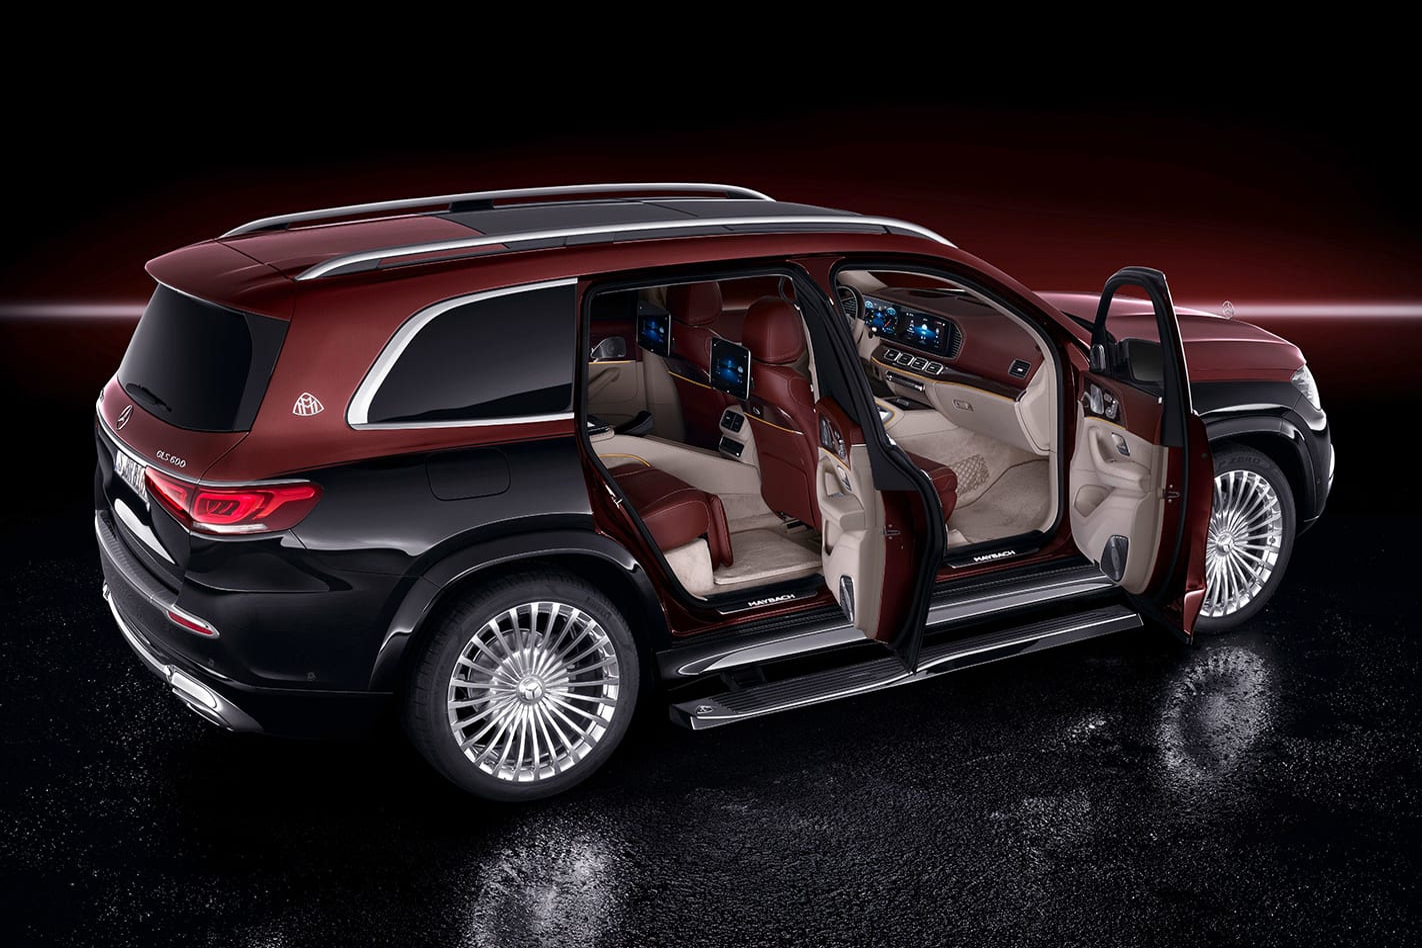 Mercedes-Maybach GLS600 revealed